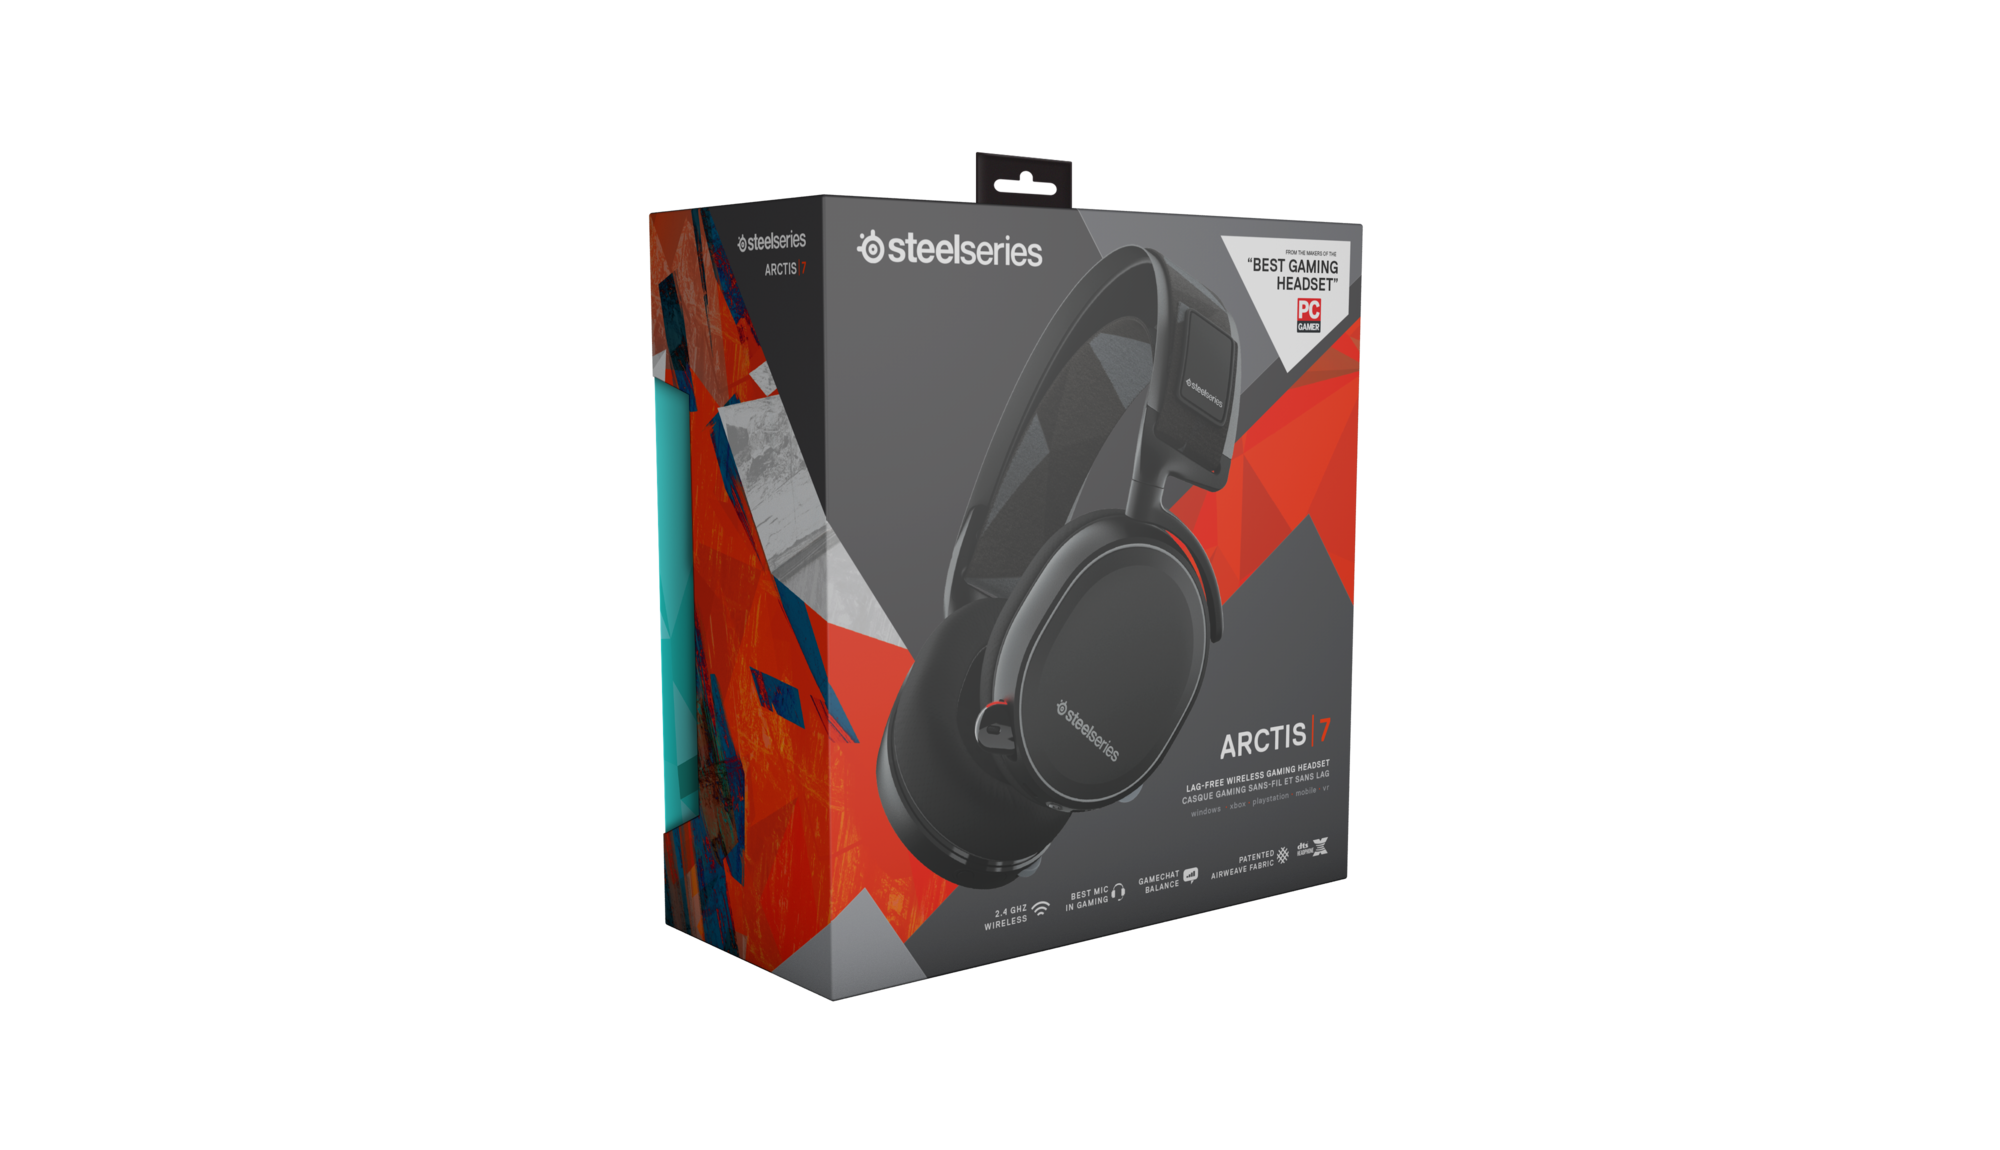 SteelSeries Arctic 7 Black Edition